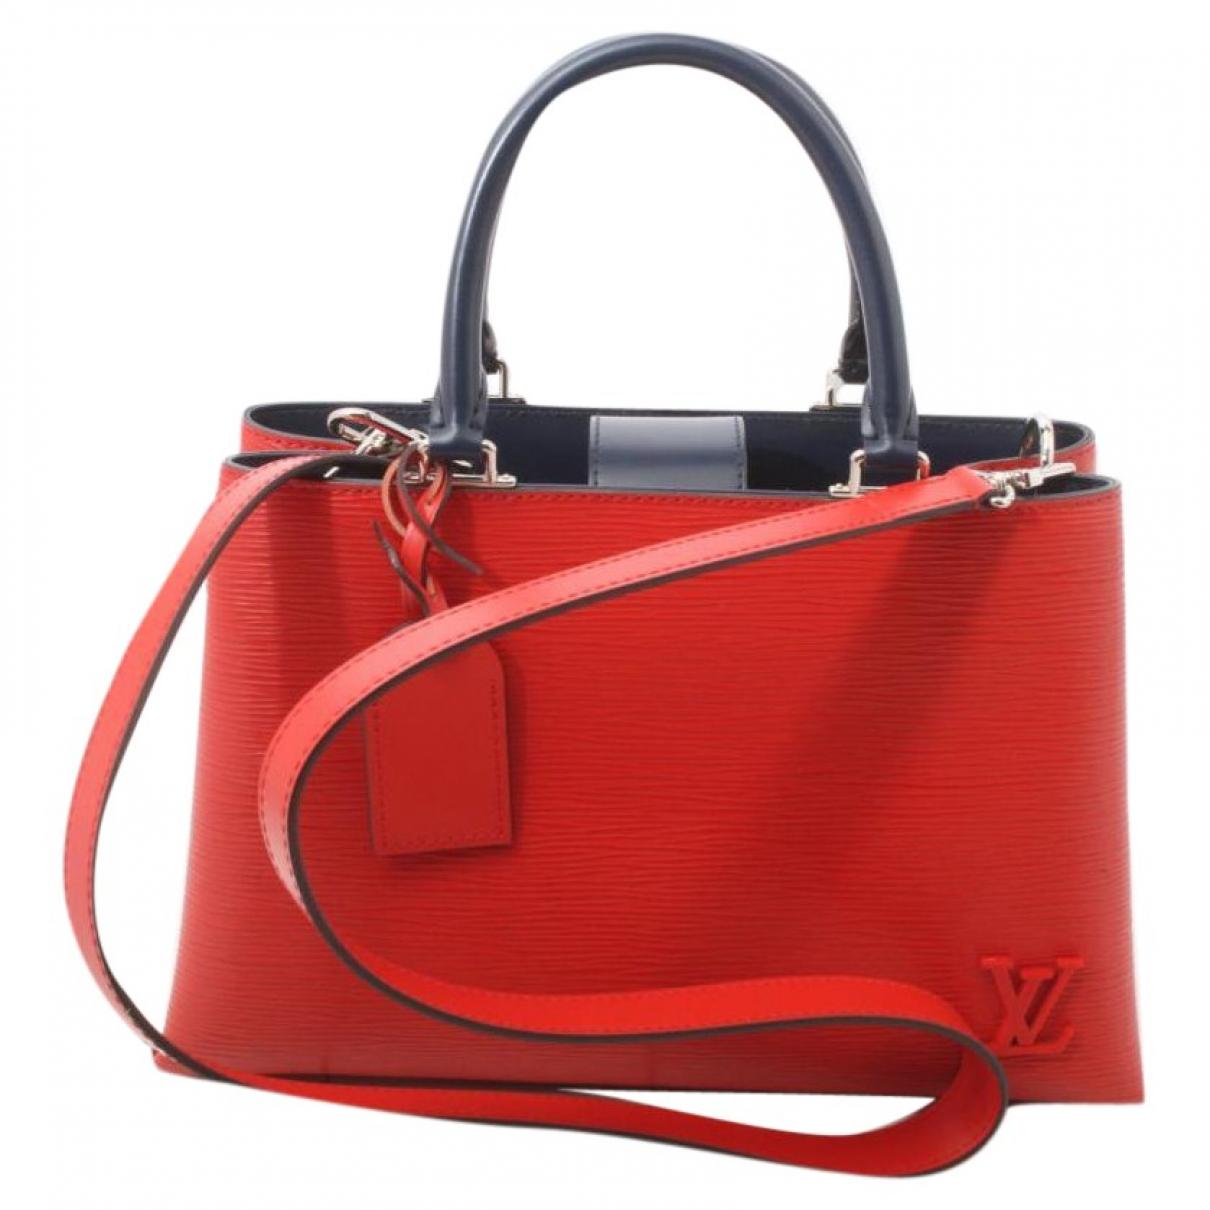 Louis Vuitton Kleber Red Leather handbag for Women \N